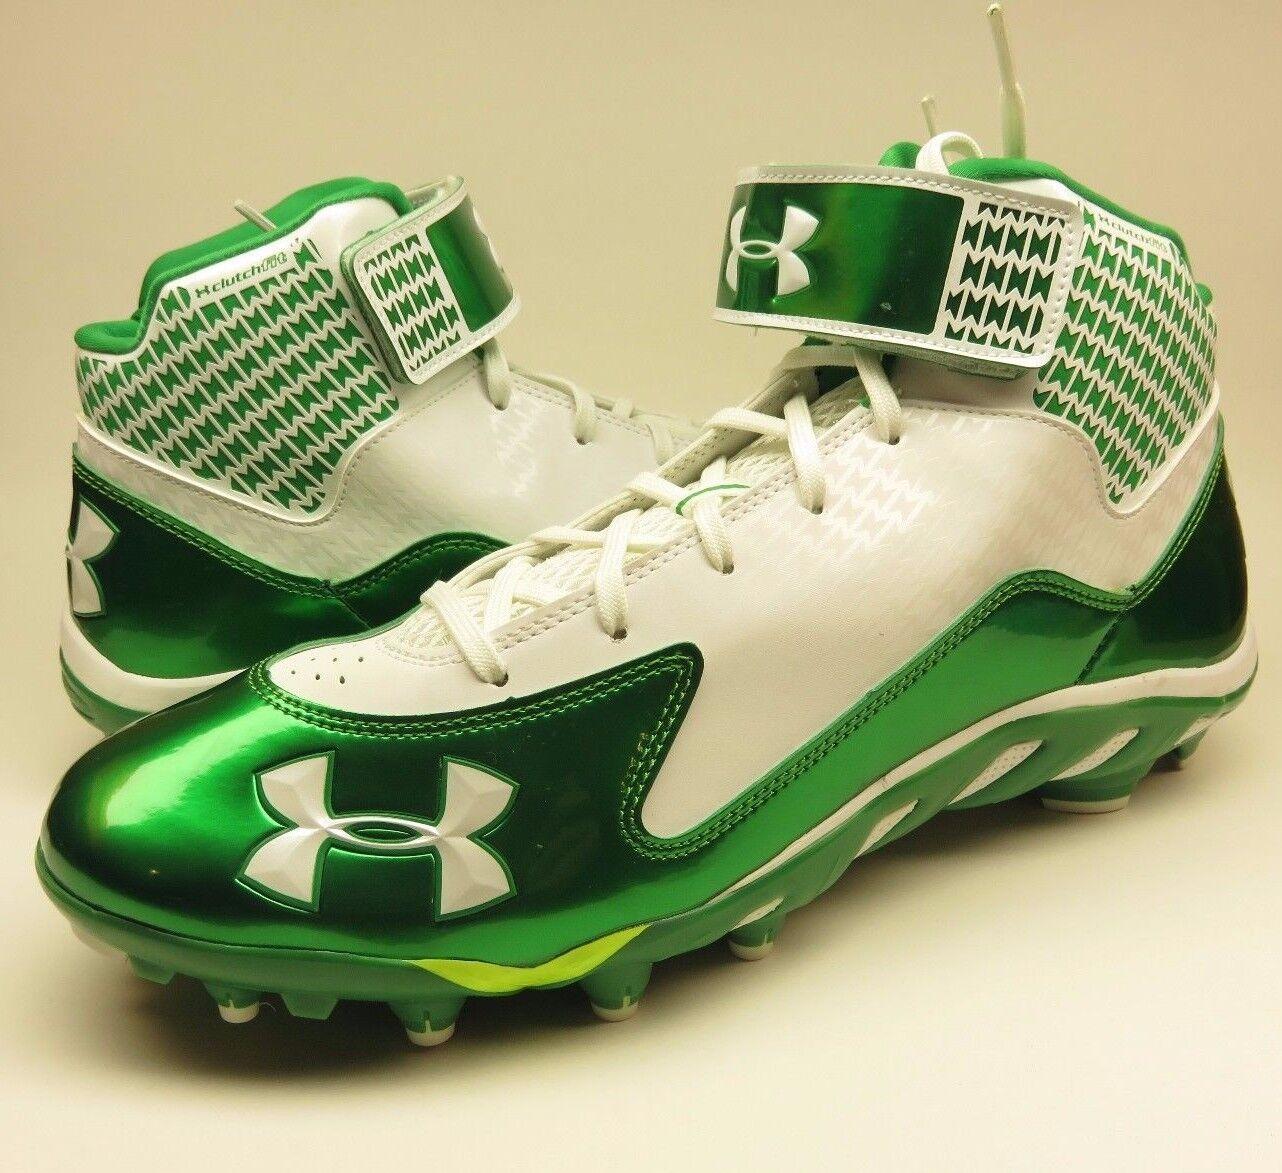 Under Armour Team Spine Fierce MC Size 13.5 Green/White Football da Cleats Scarpe classiche da Football uomo b7fba9